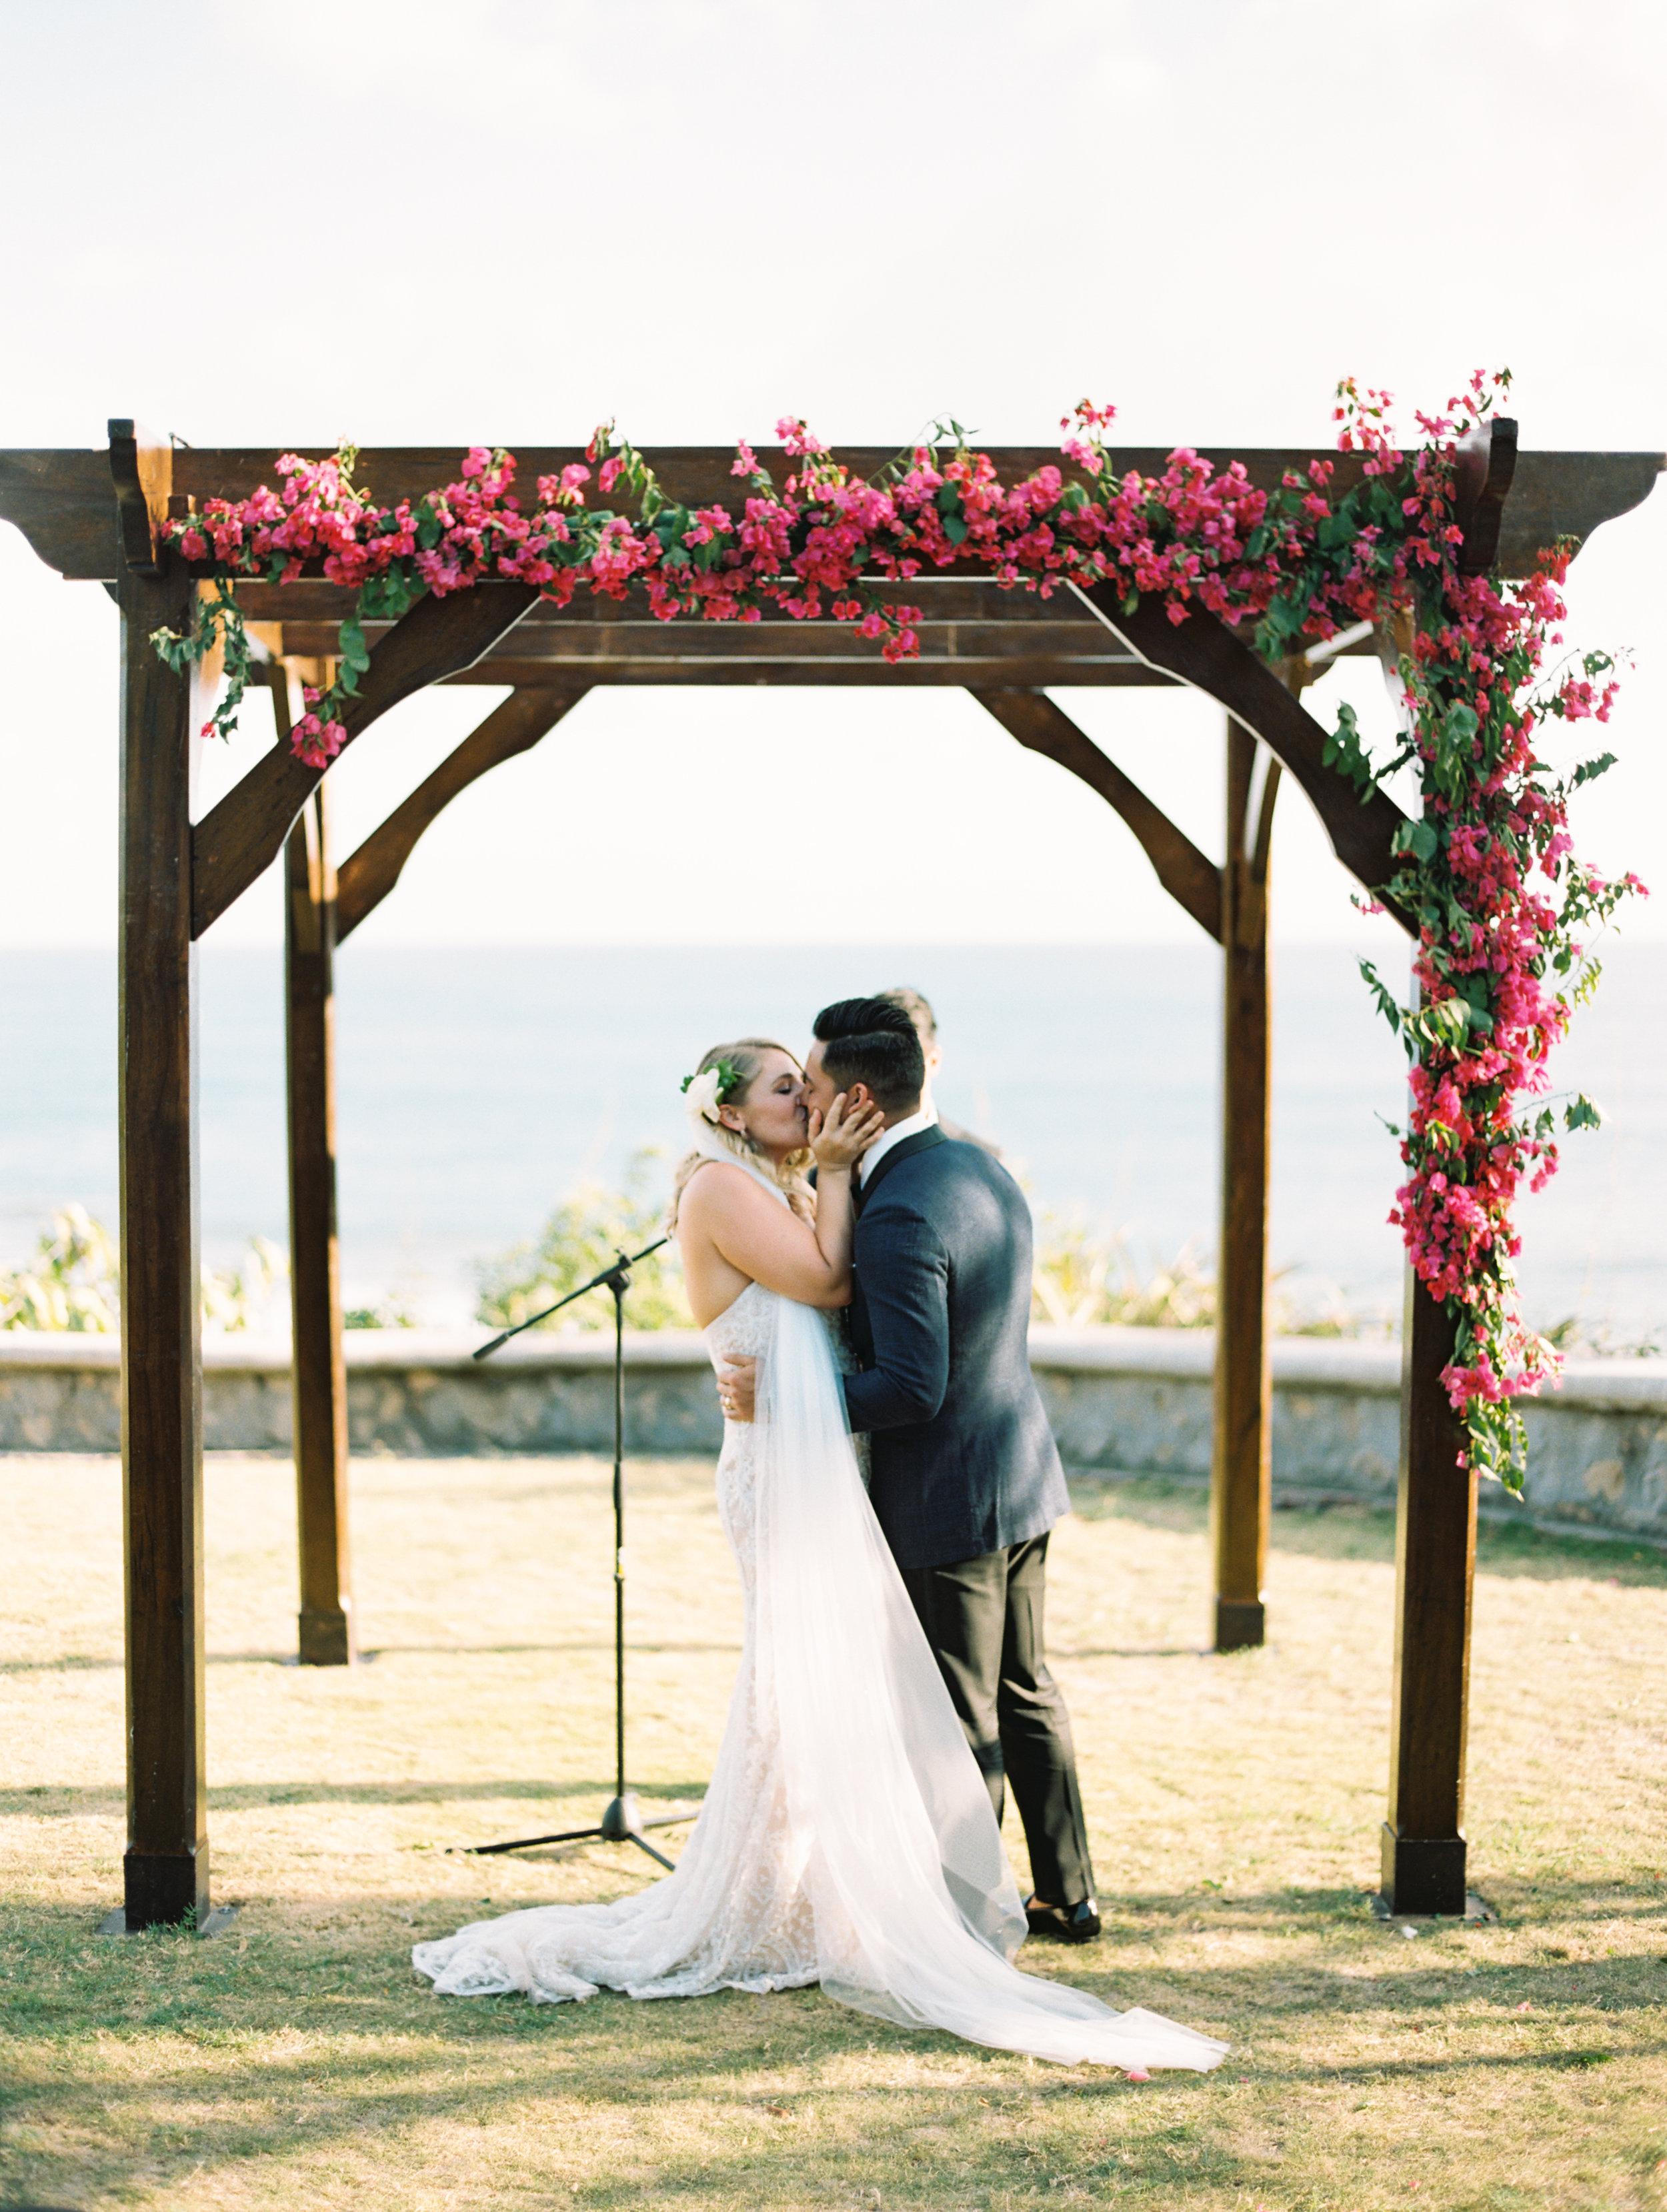 377-fine-art-film-photographer-destination-wedding-nicaragua-jacob+cammye-brumley & wells.jpg